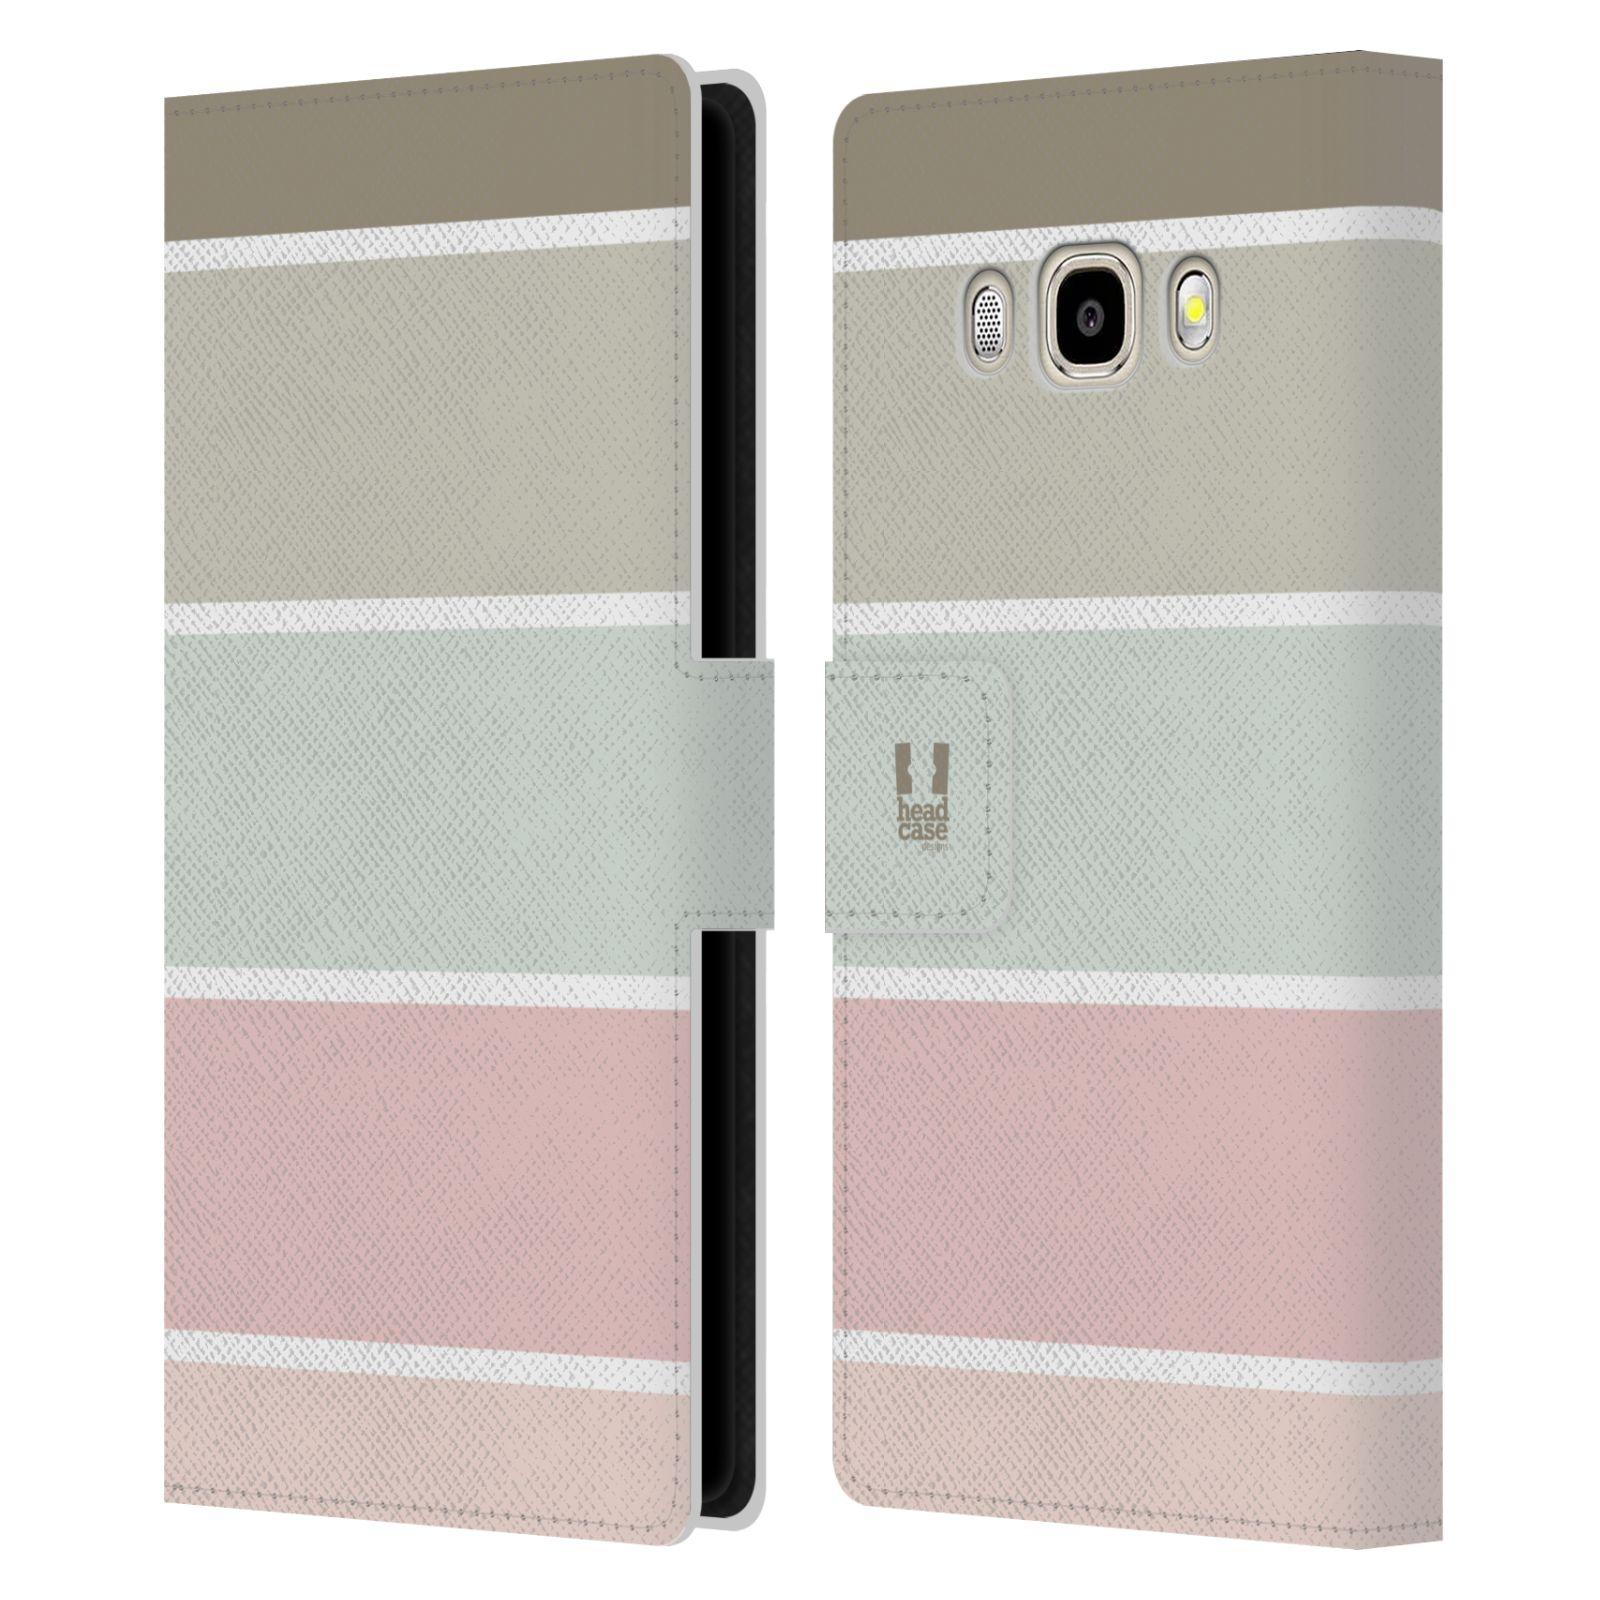 HEAD CASE Flipové pouzdro pro mobil Samsung Galaxy J5 2016 Francouzský venkov pruhy růžová a šedá